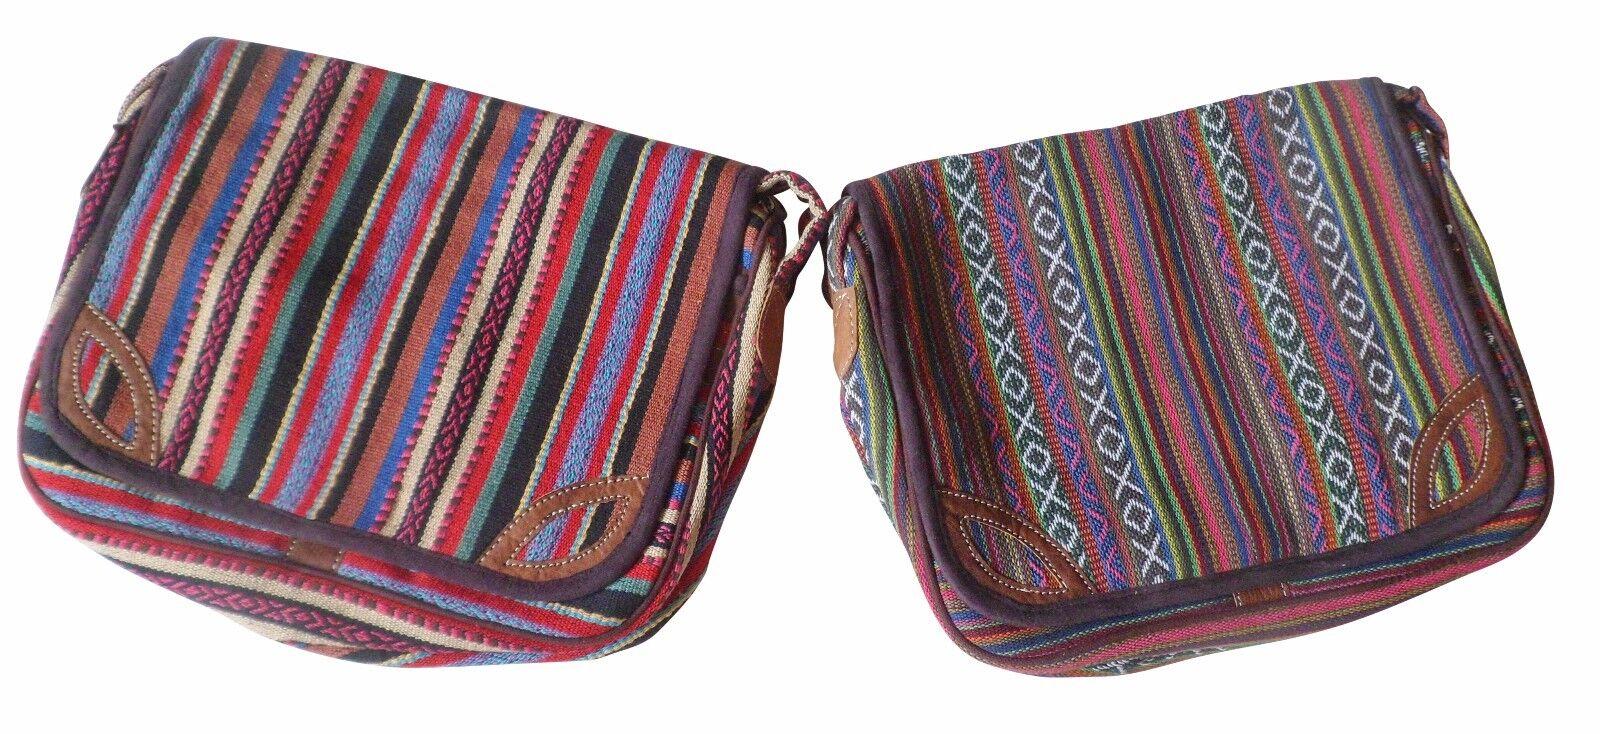 Fair Trade Nepalesisch Gheri Textil & Buffalo Leder mittelgroß Schultertasche | Discount